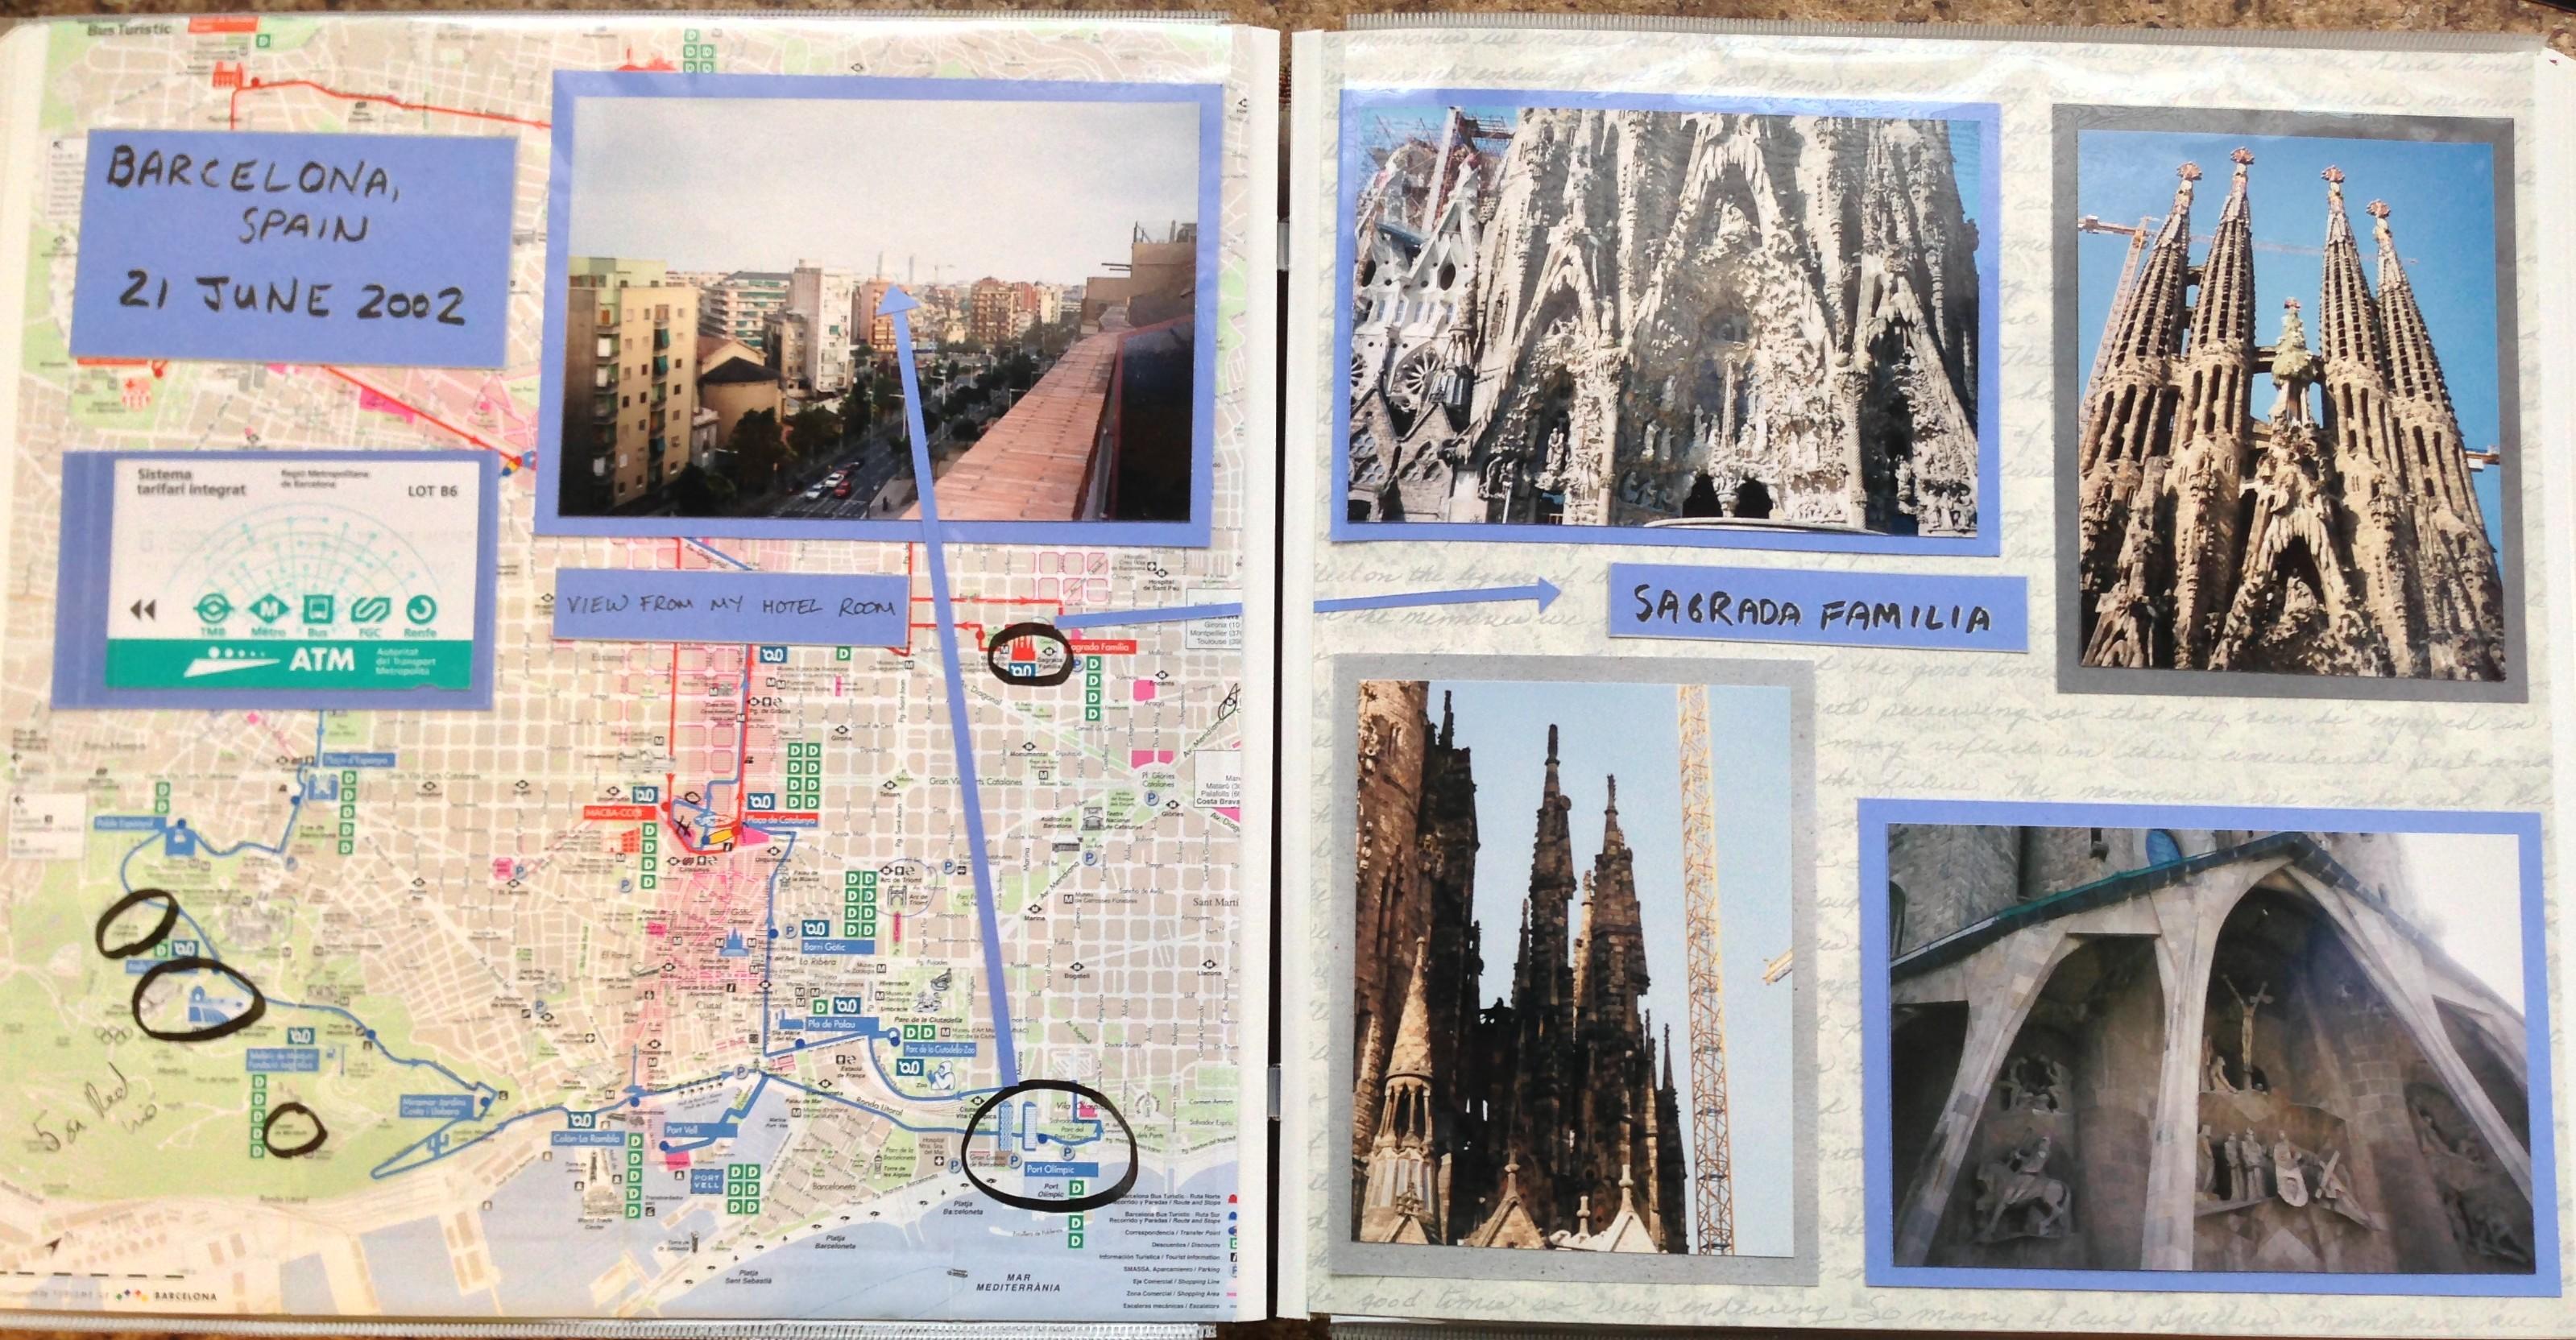 Europe scrapbook ideas - Europe Vacation Barcelona Spain